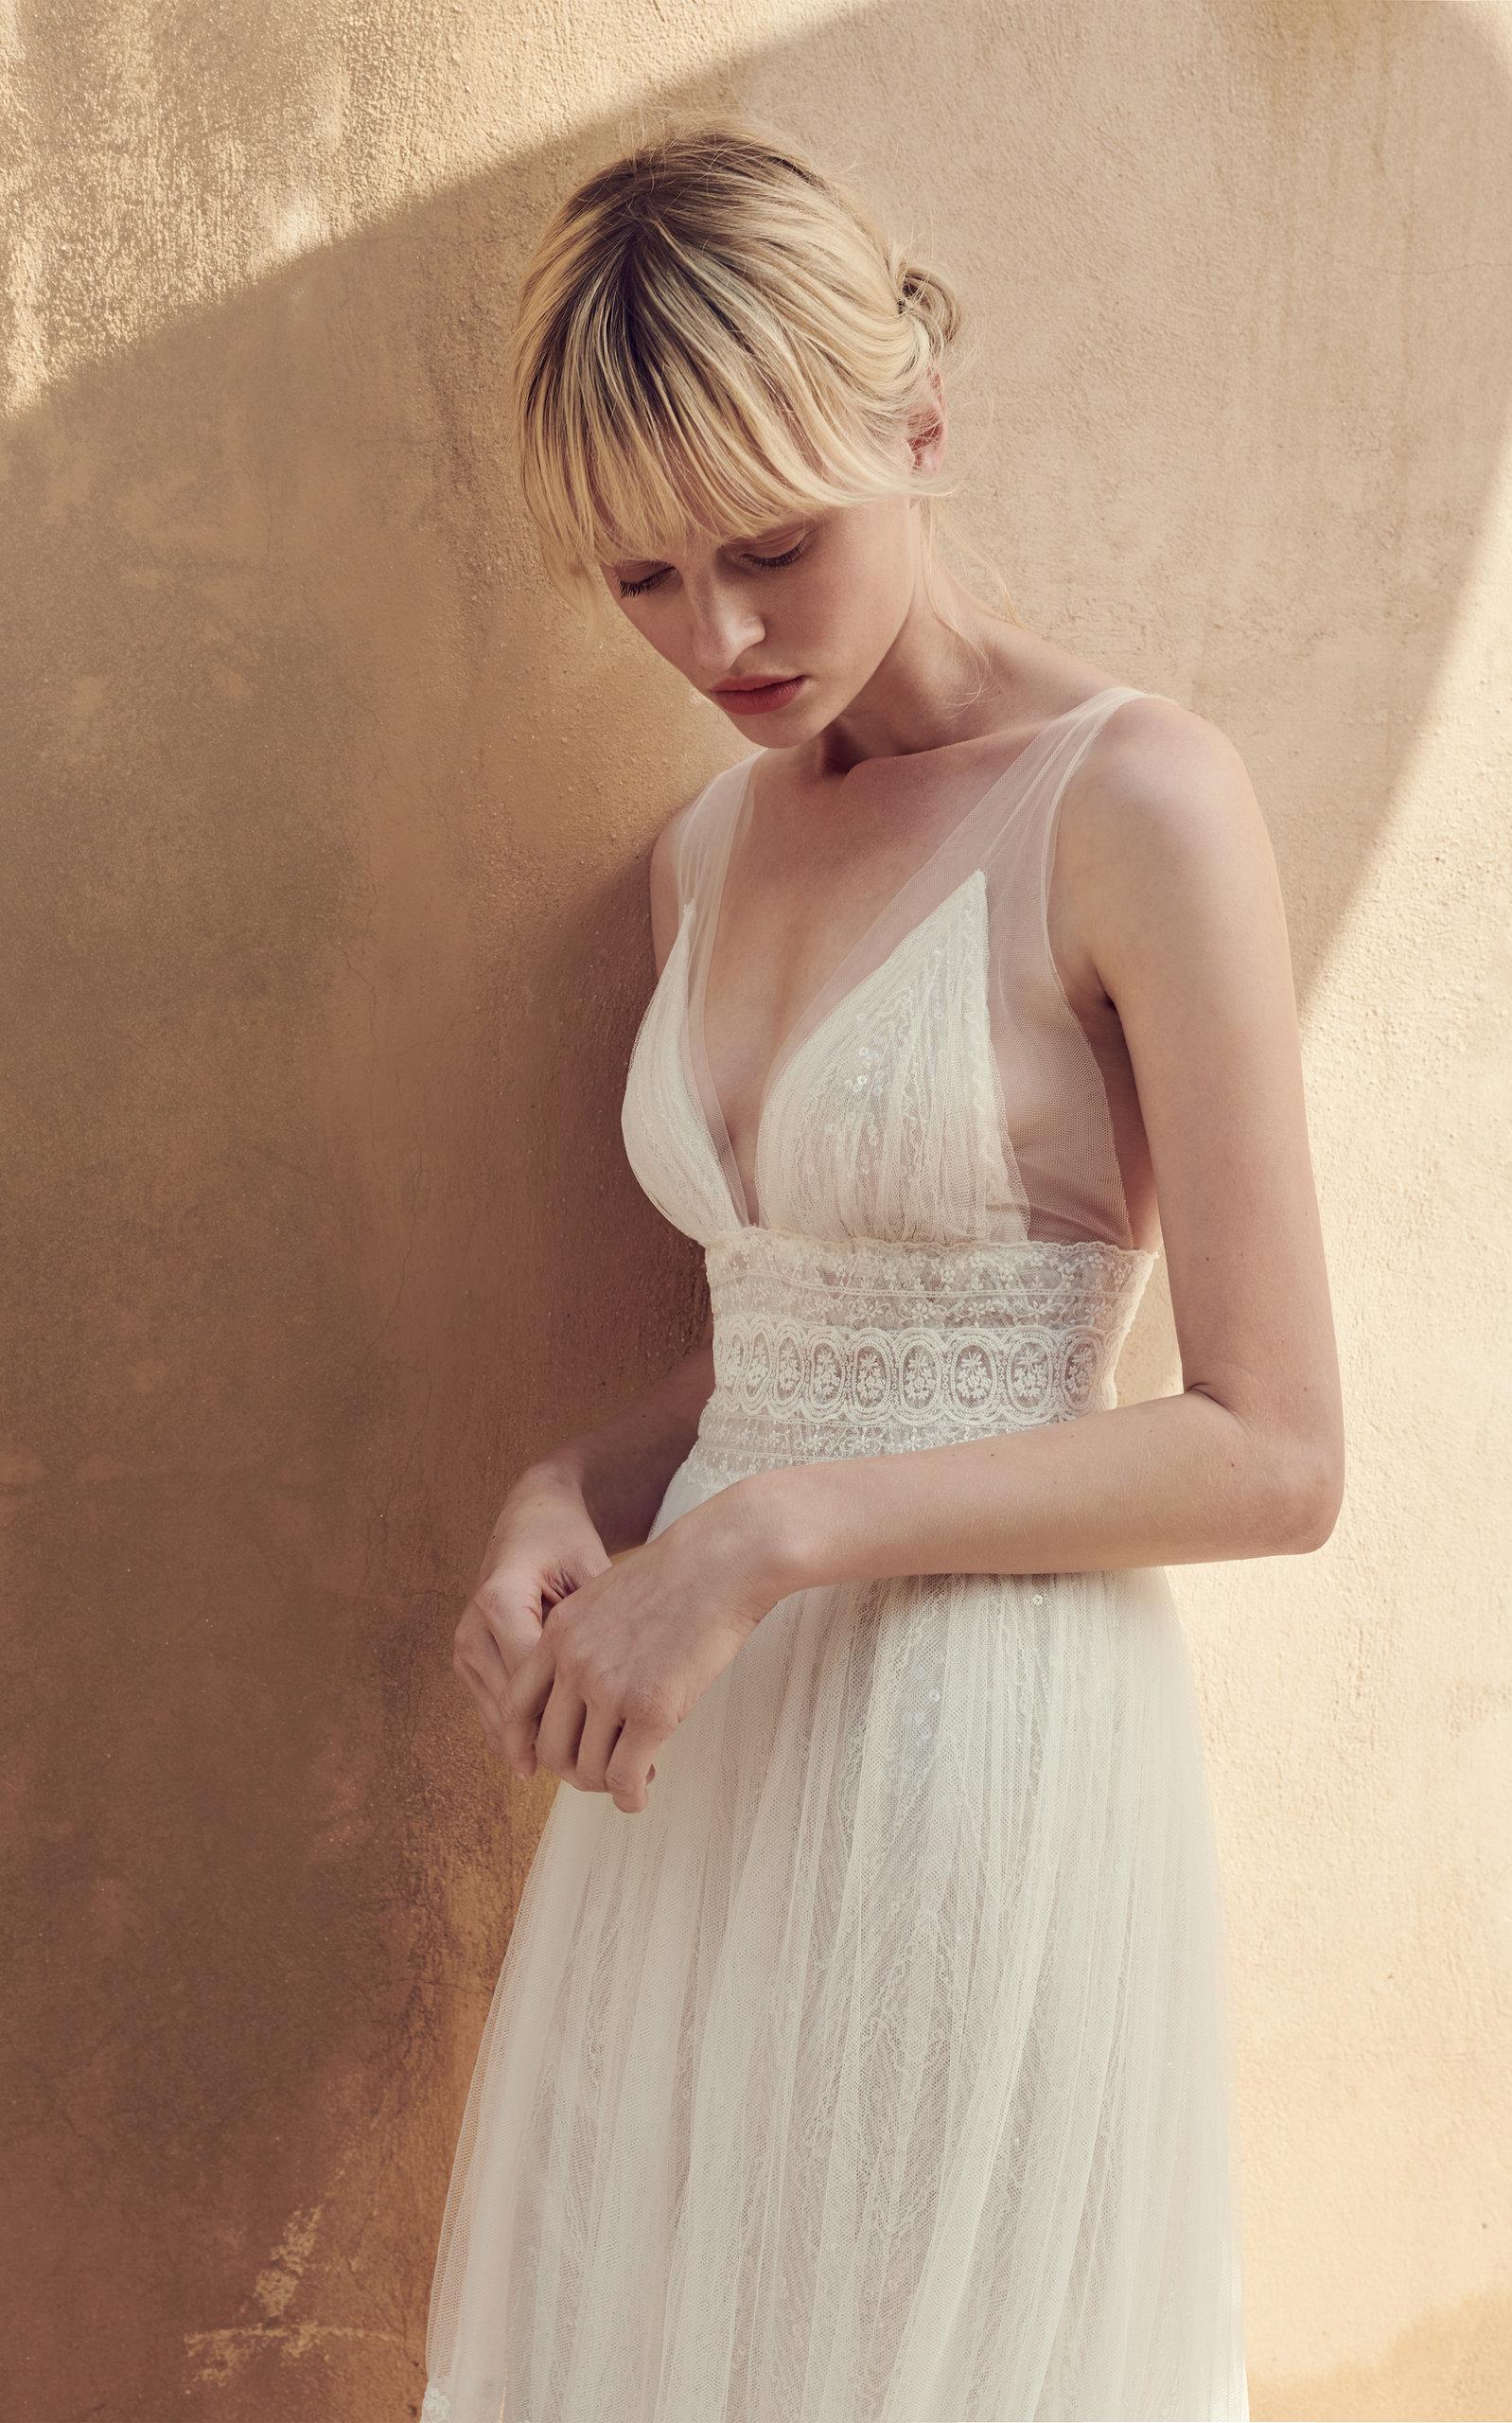 COSTARELLOS BRIDAL V Neck Illusion-Strap Fit And Flare Gown in White